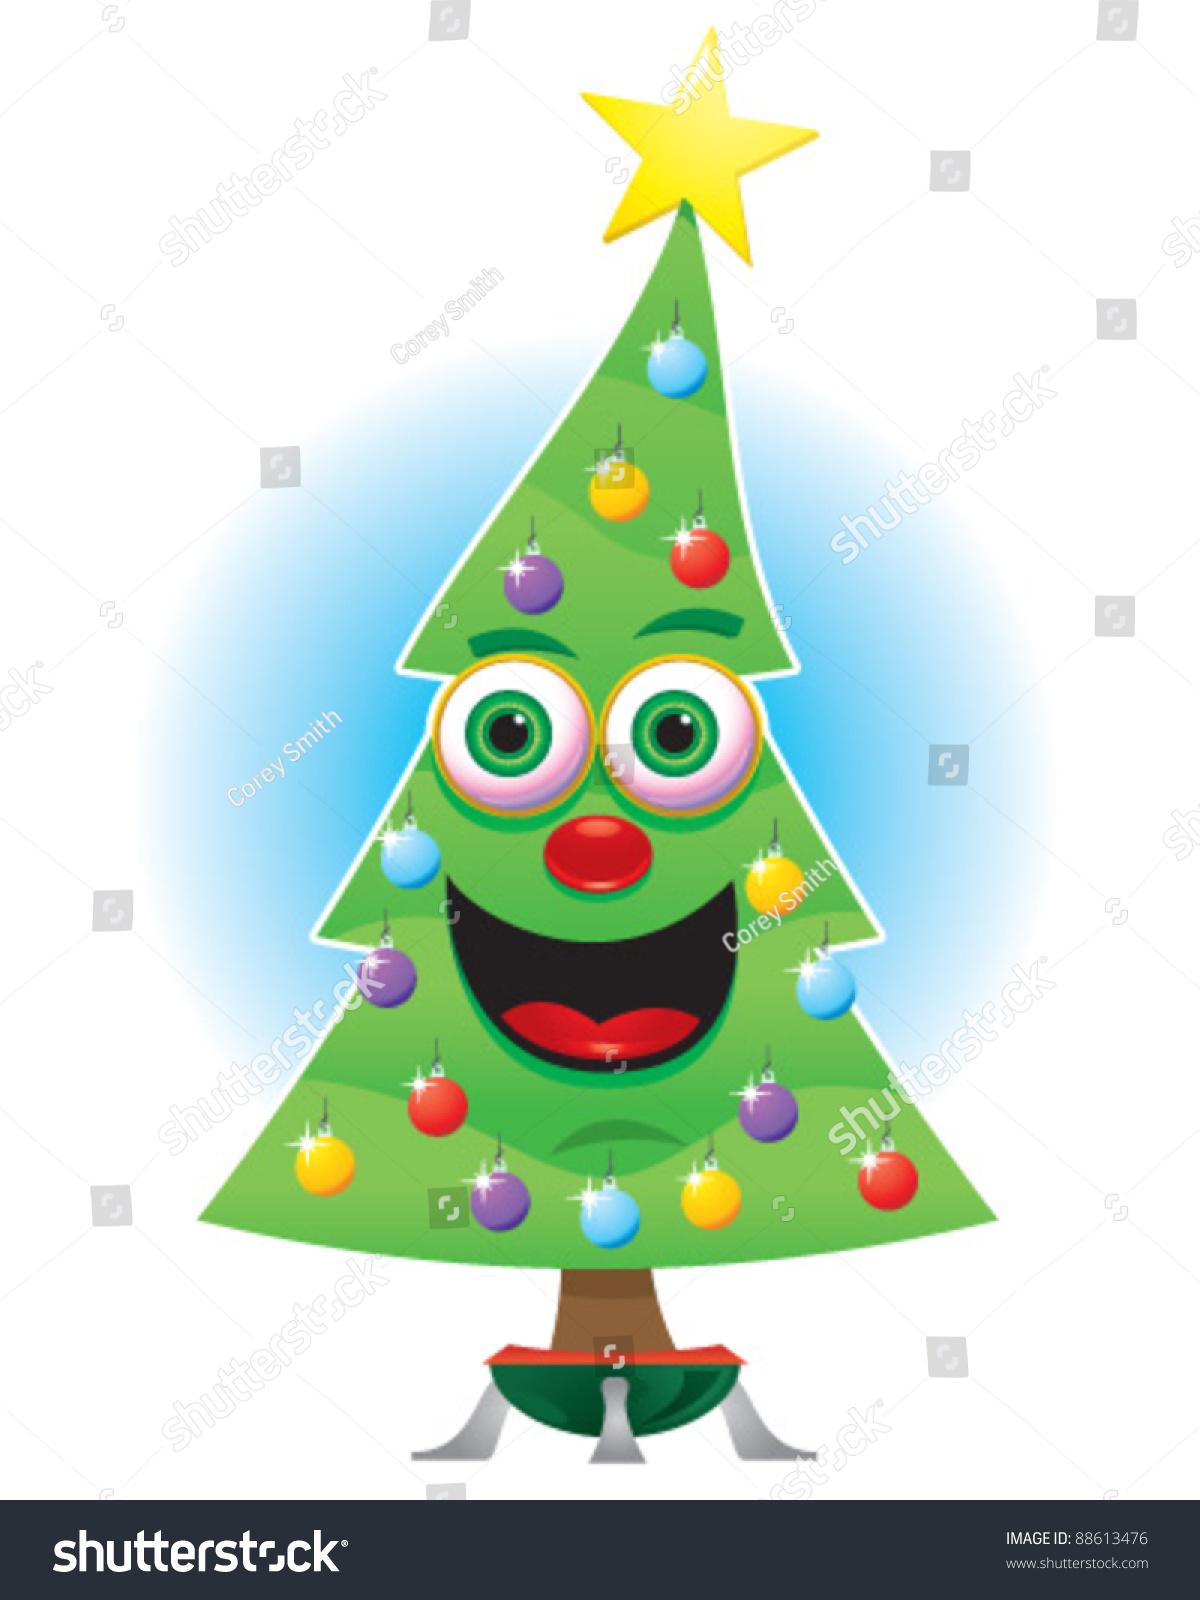 Animated Happy Christmas Tree Stock Vector Illustration